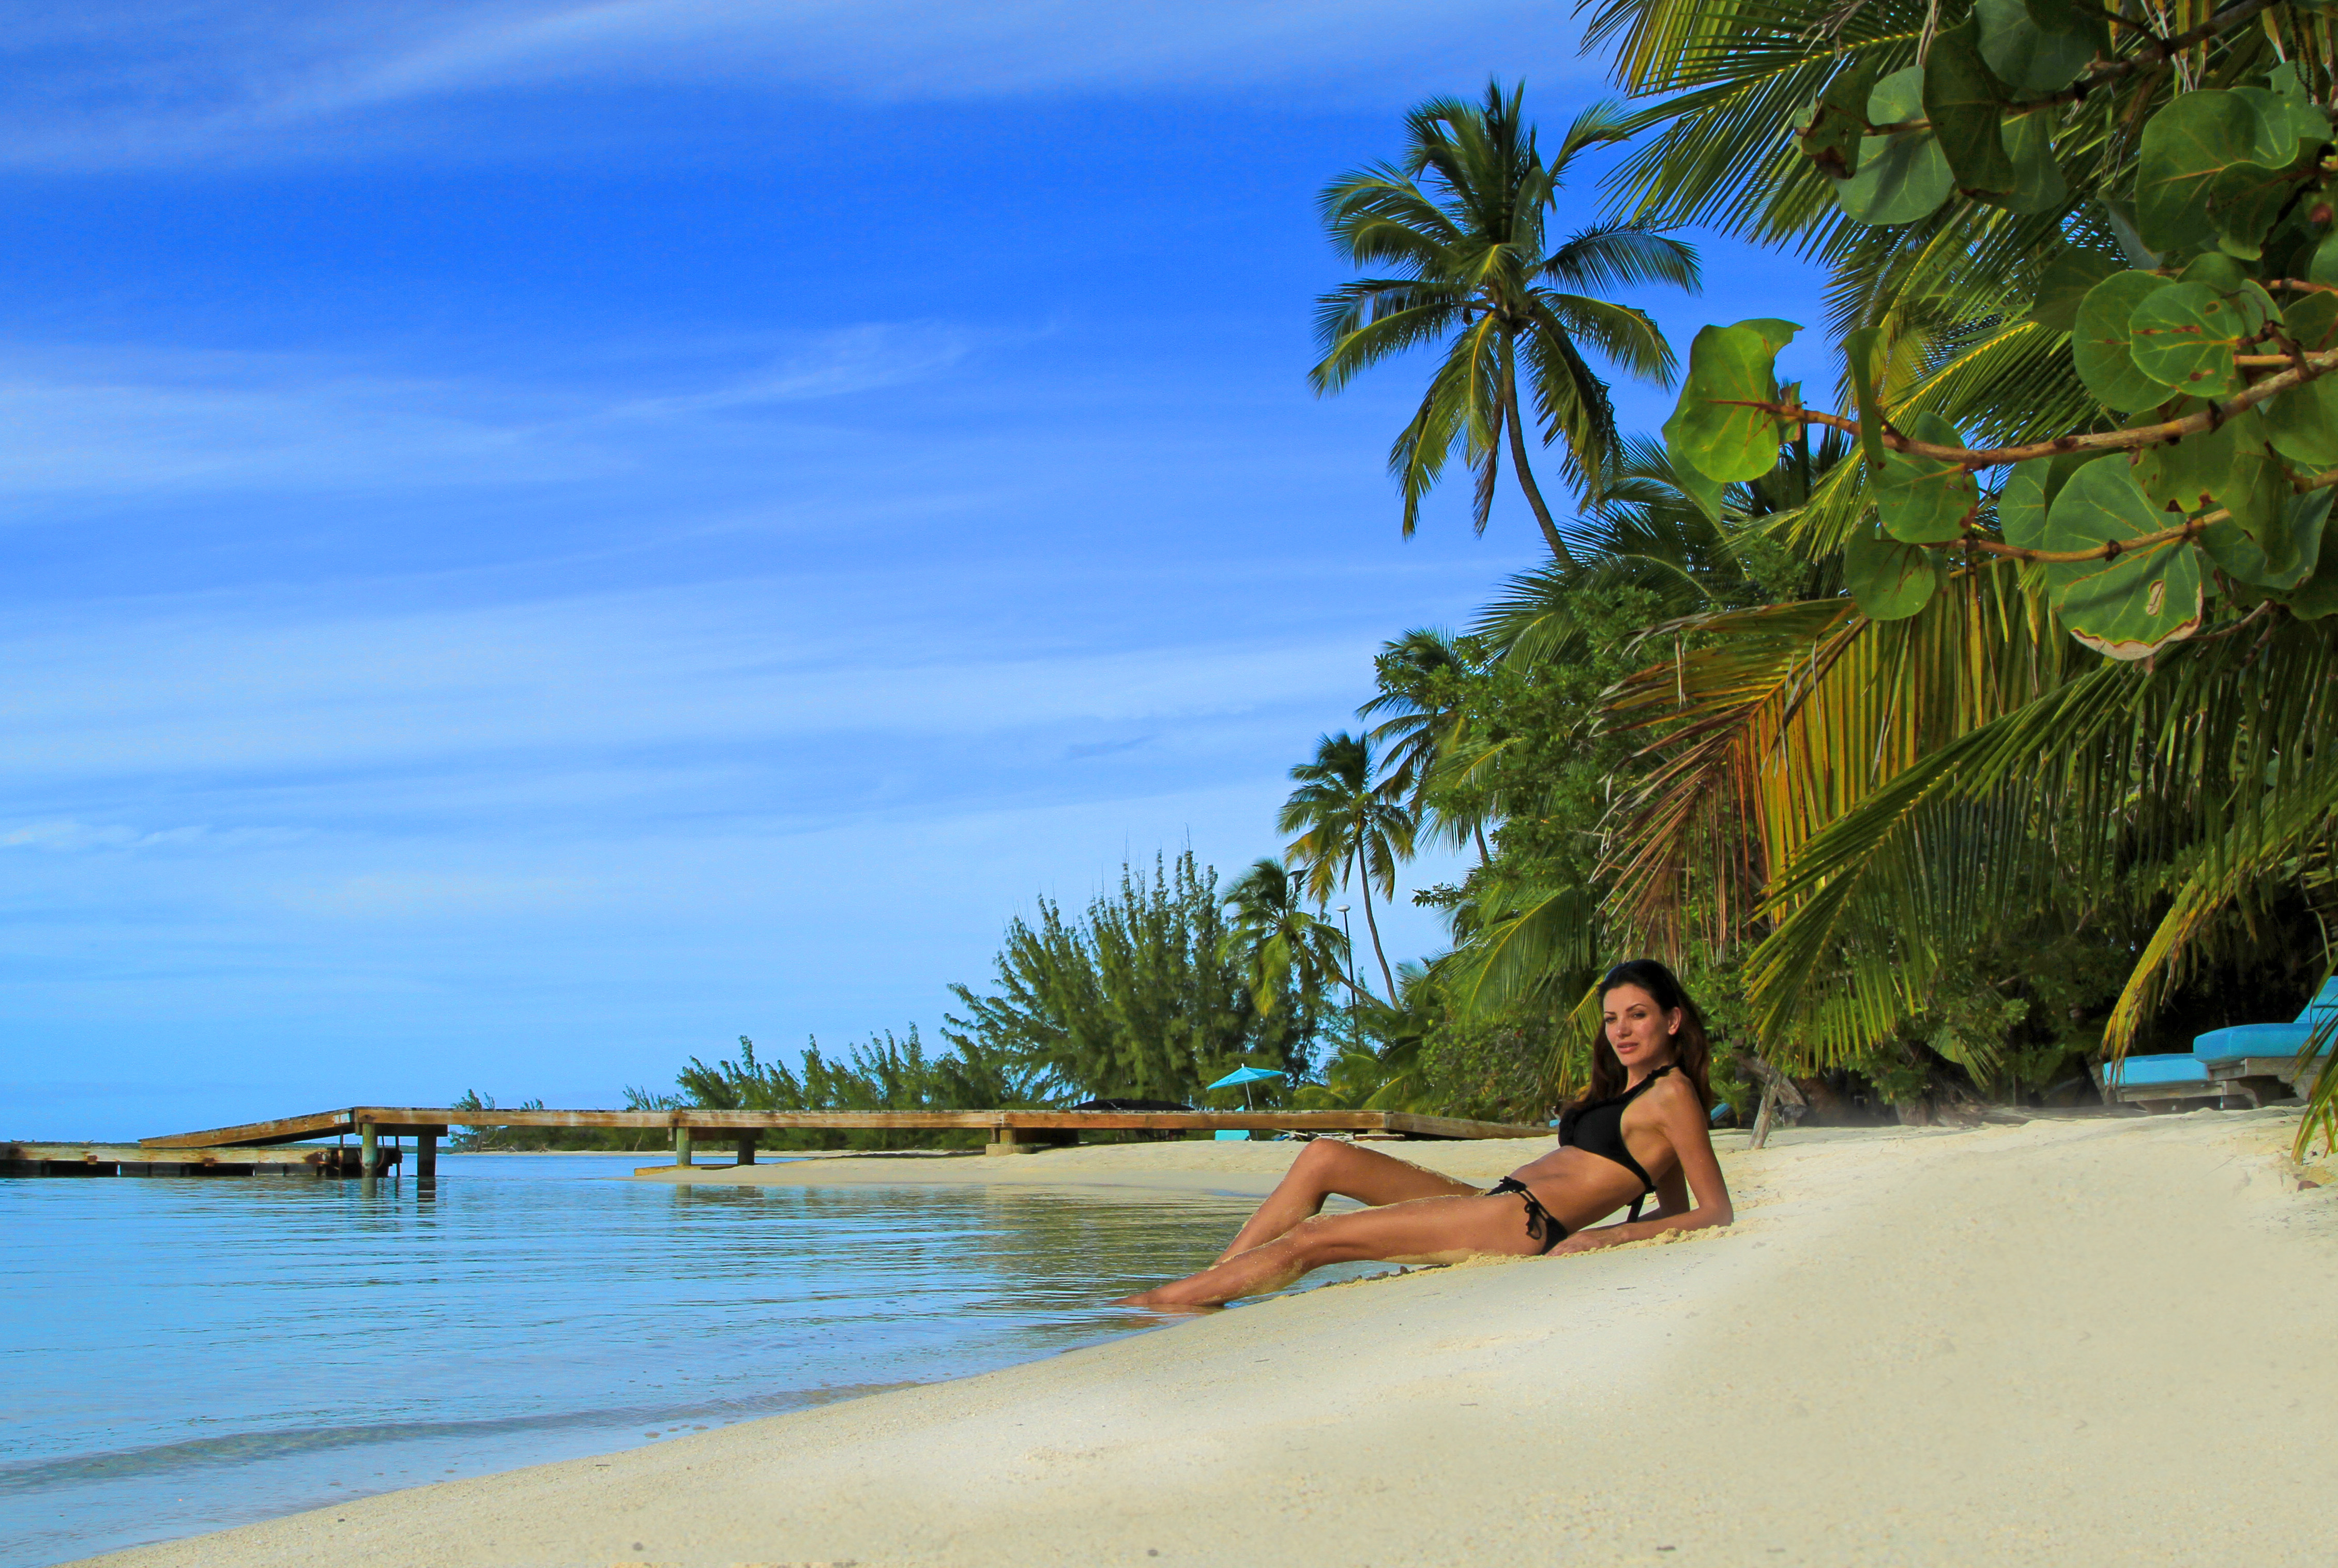 Bahamalar Tiamo Resort lüks balayı oteli plajı